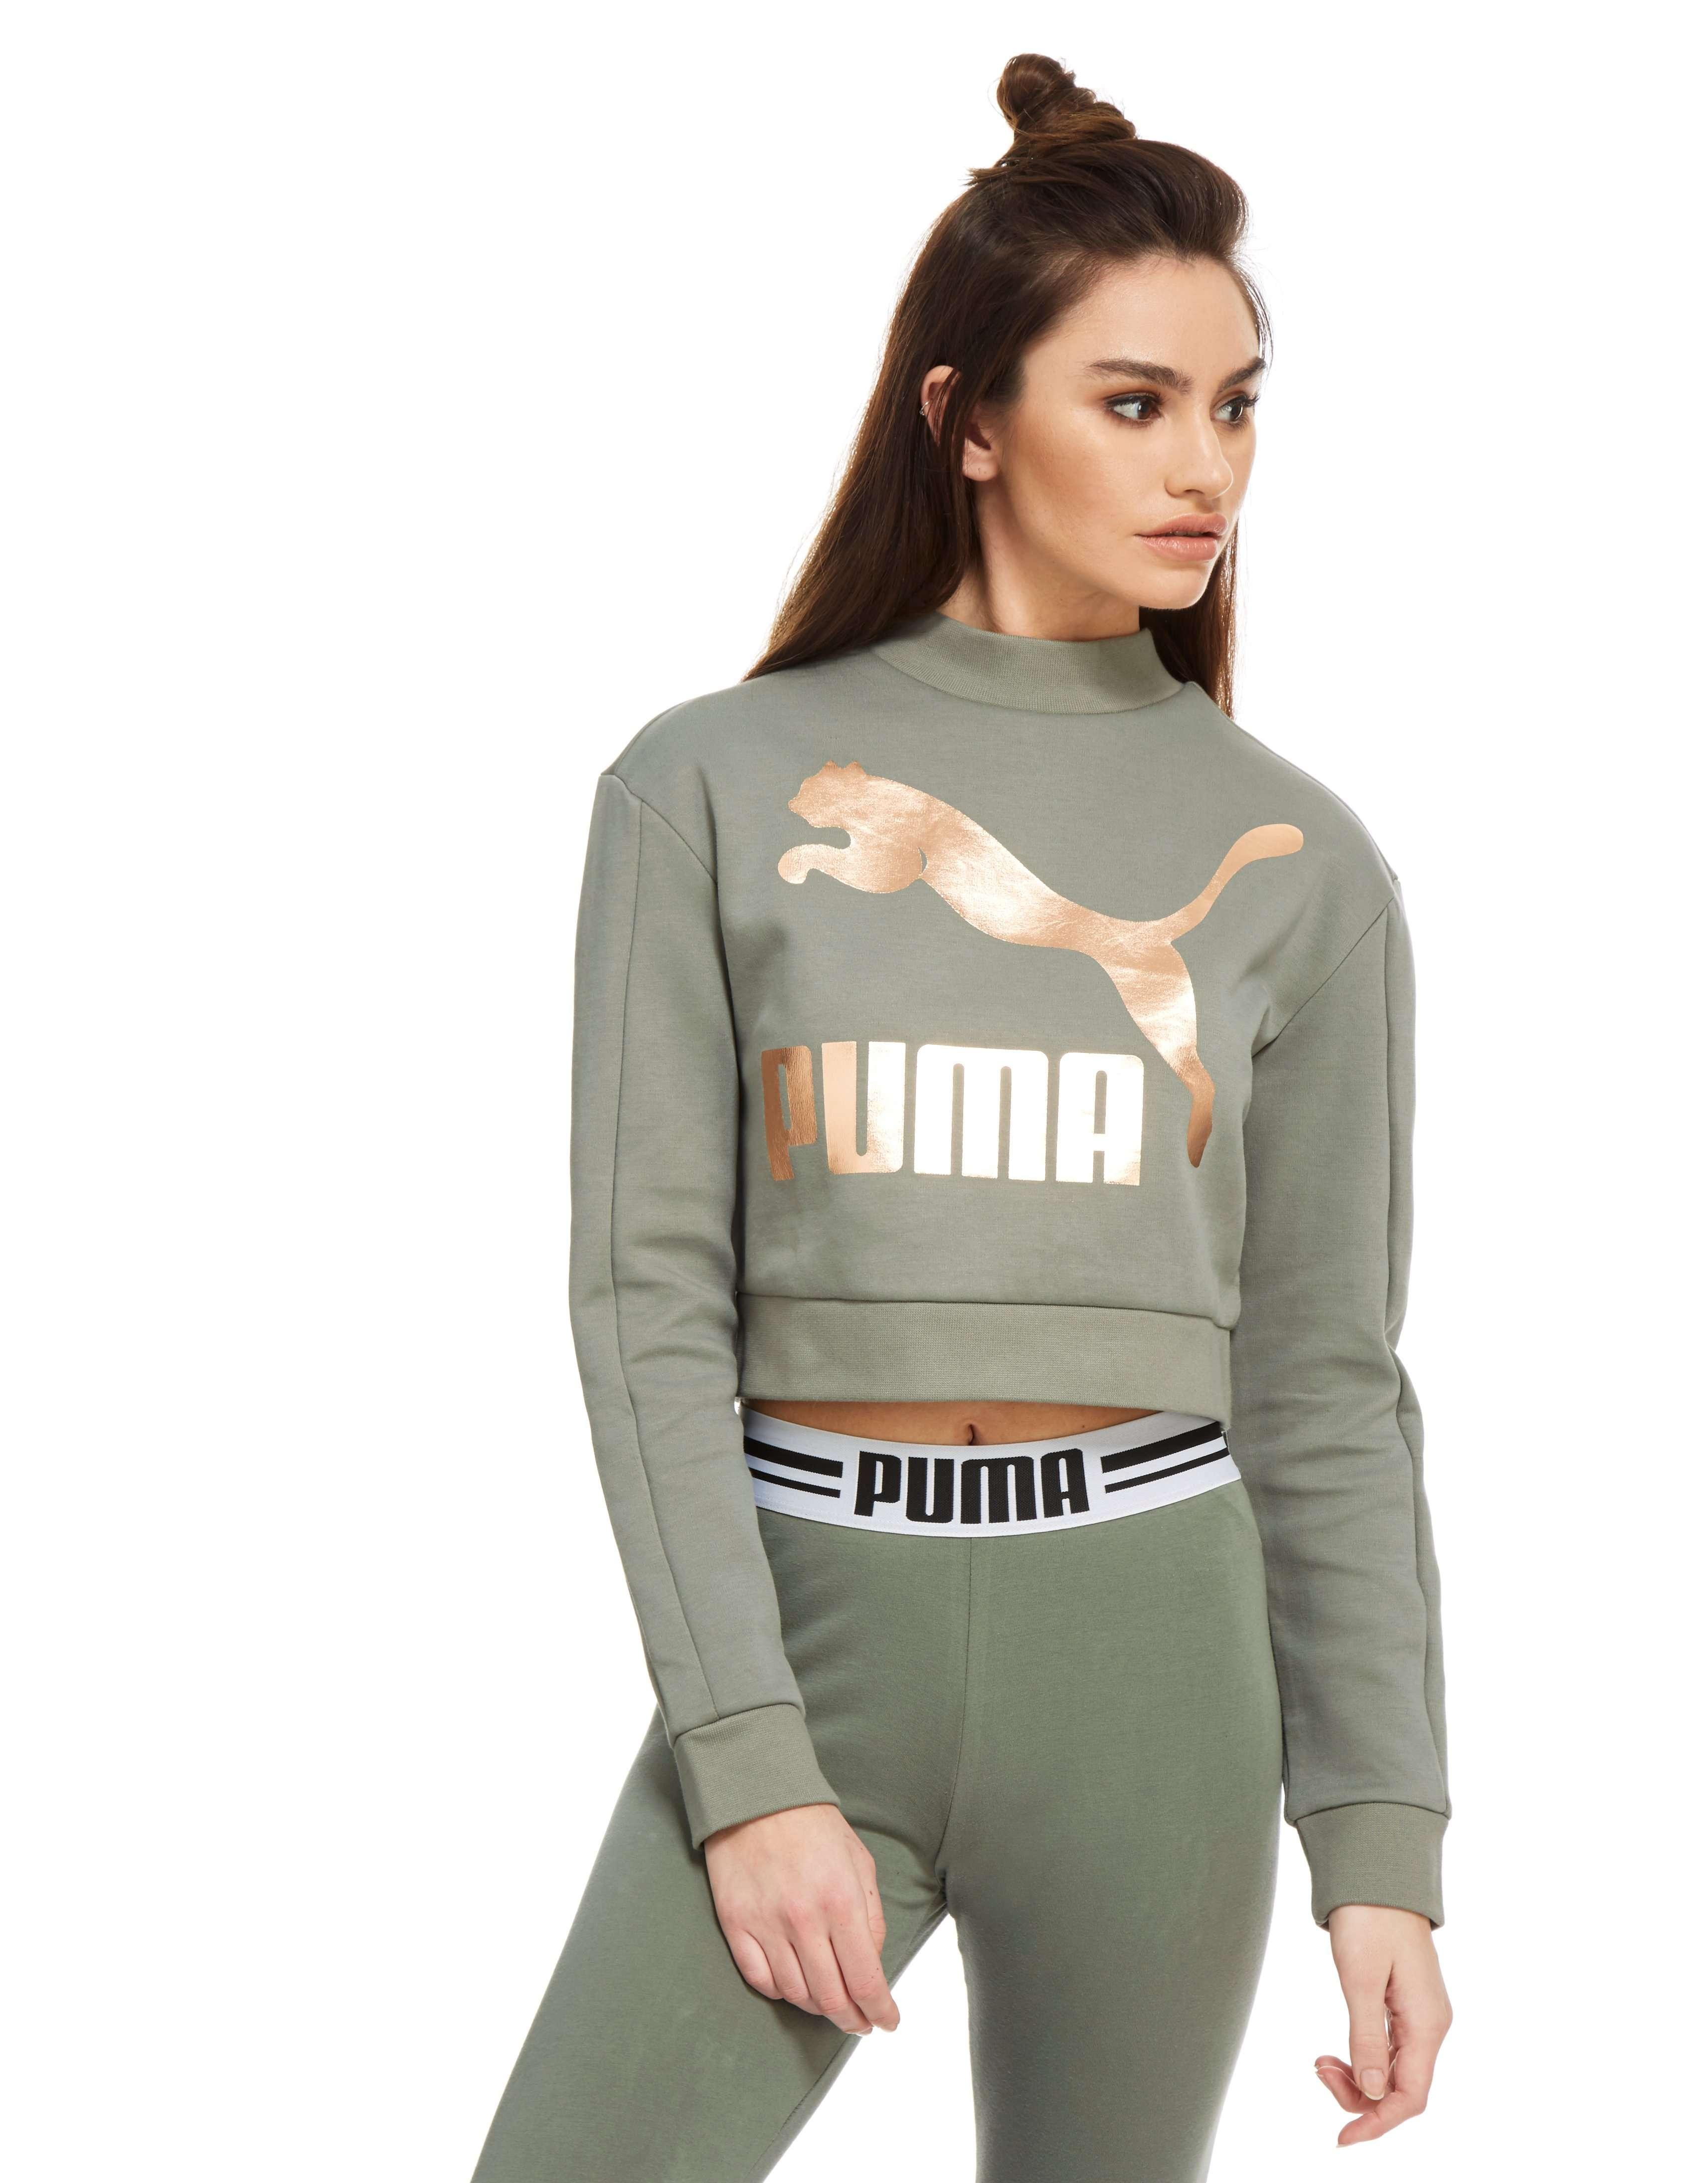 PUMA Sweatshirt High Neck Crew Femme